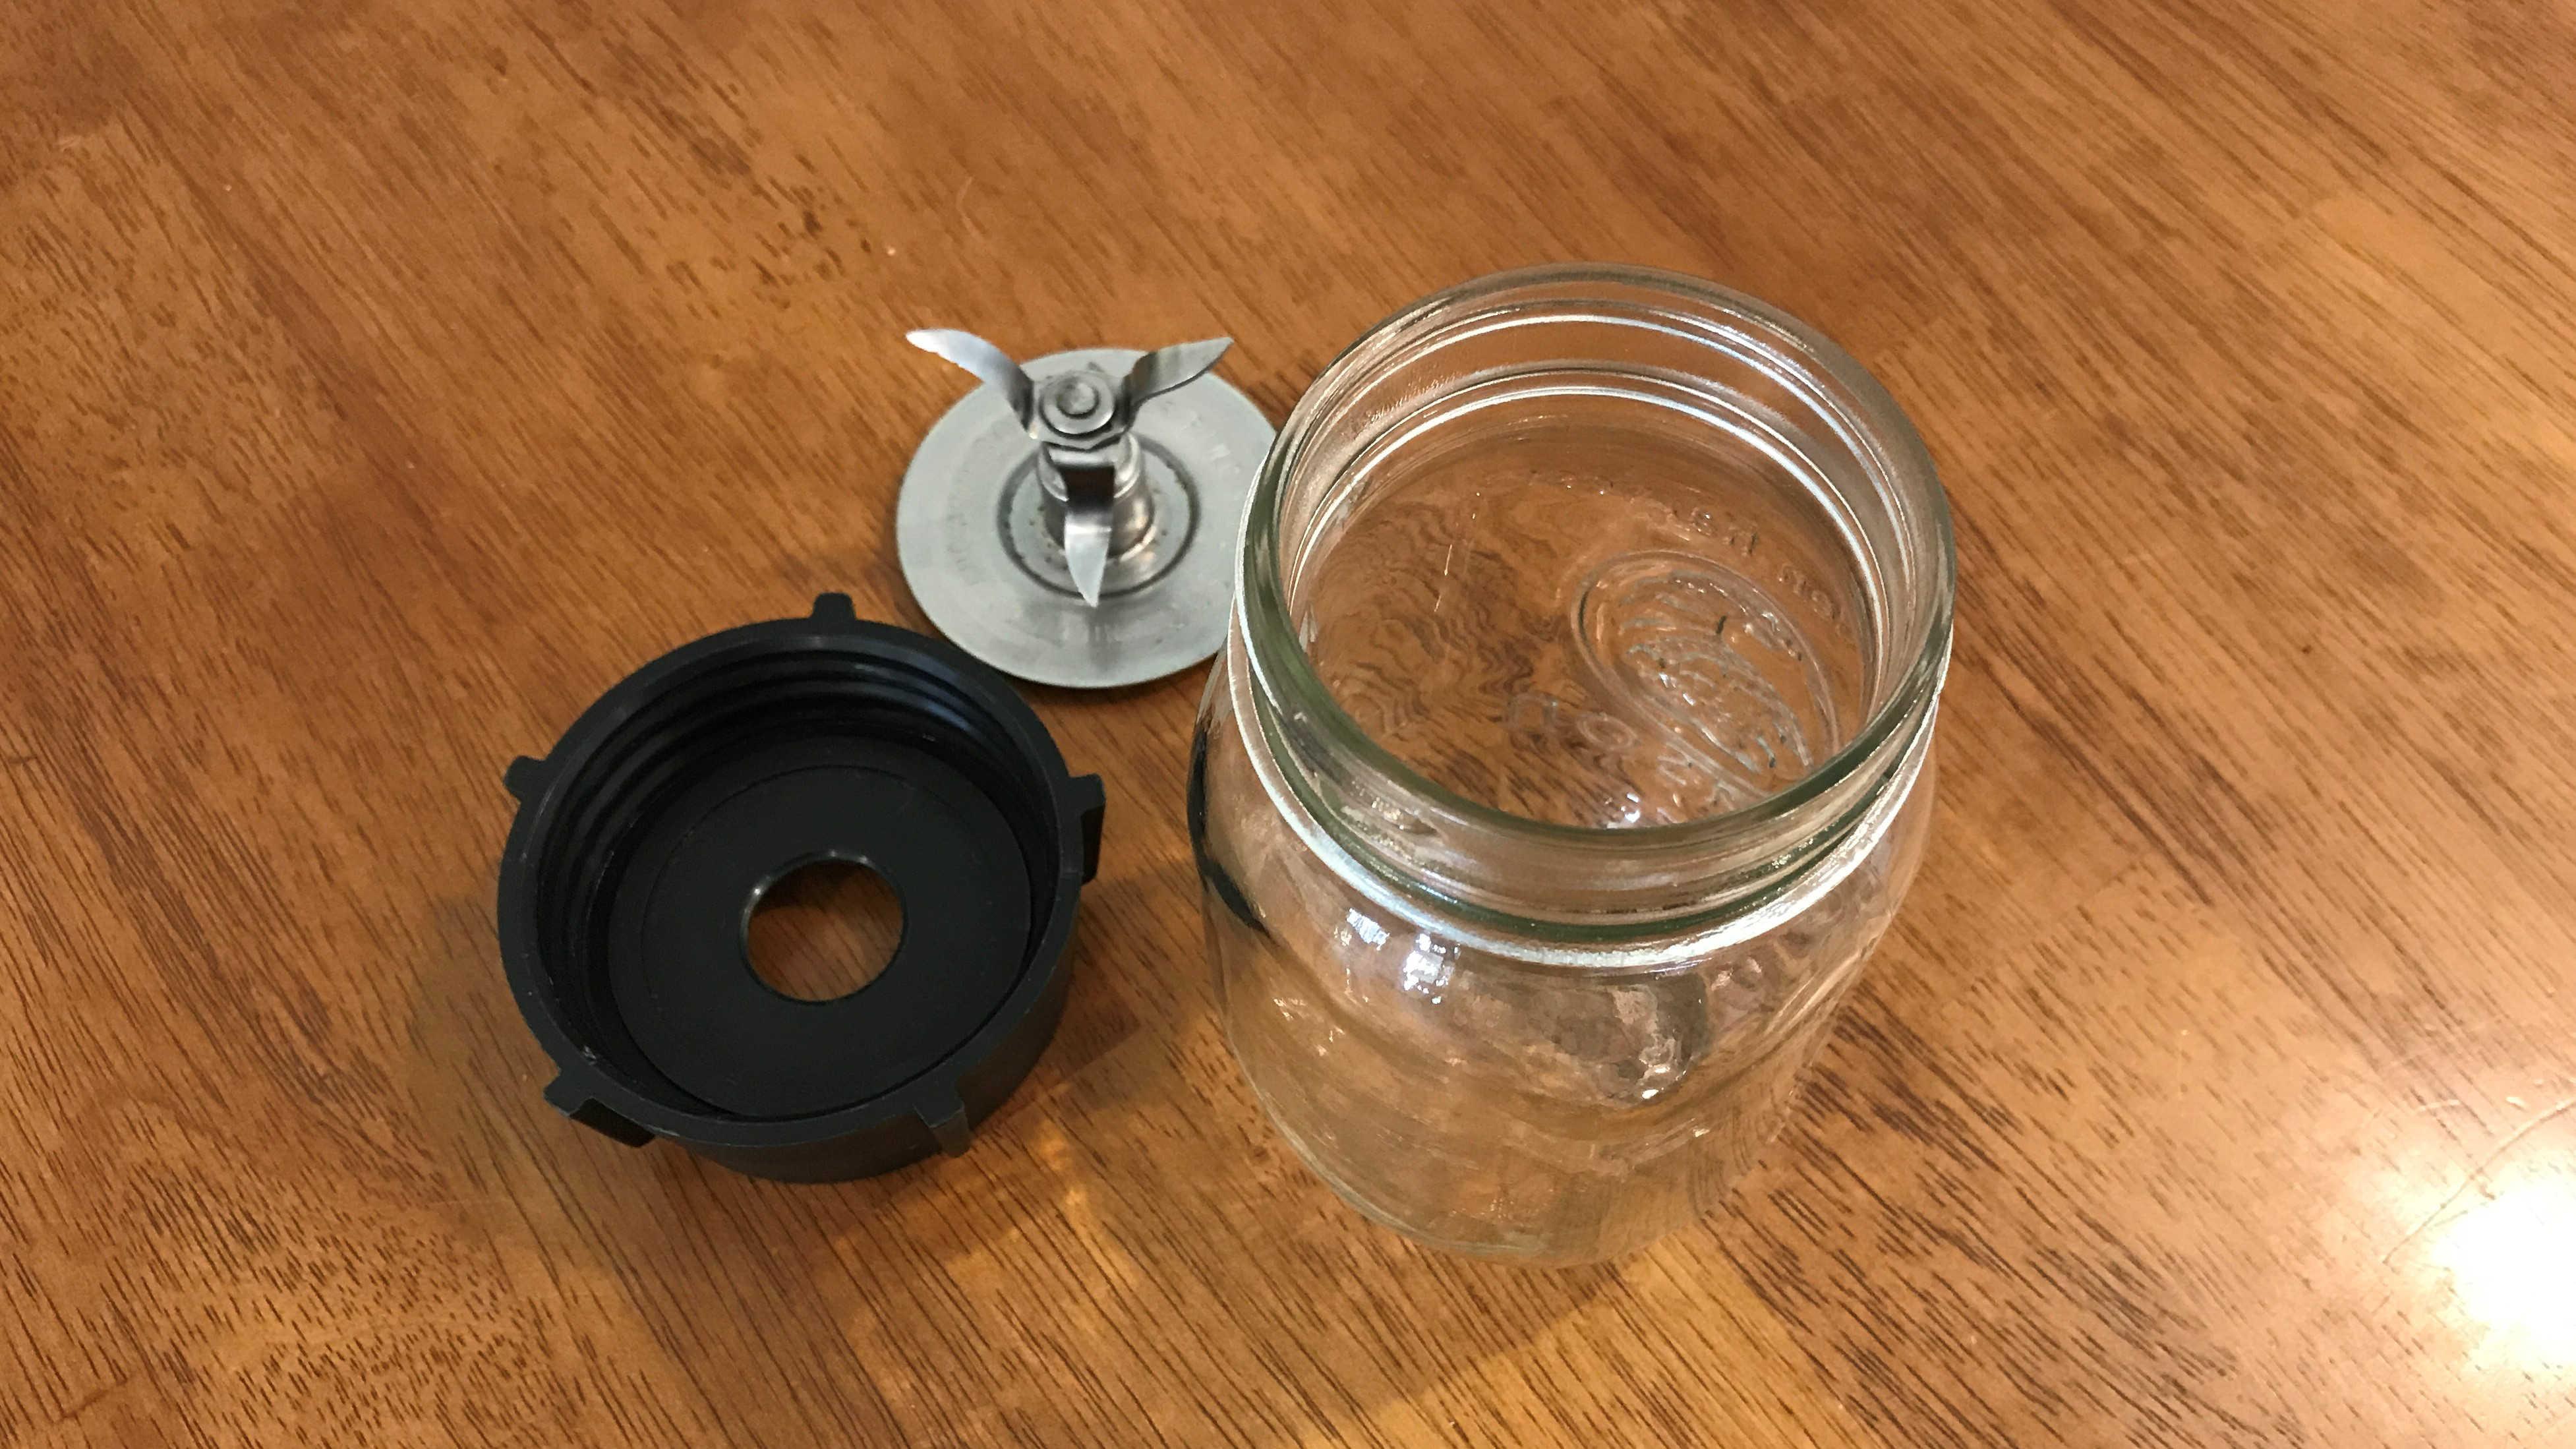 Ball Jar Smoothies Blade